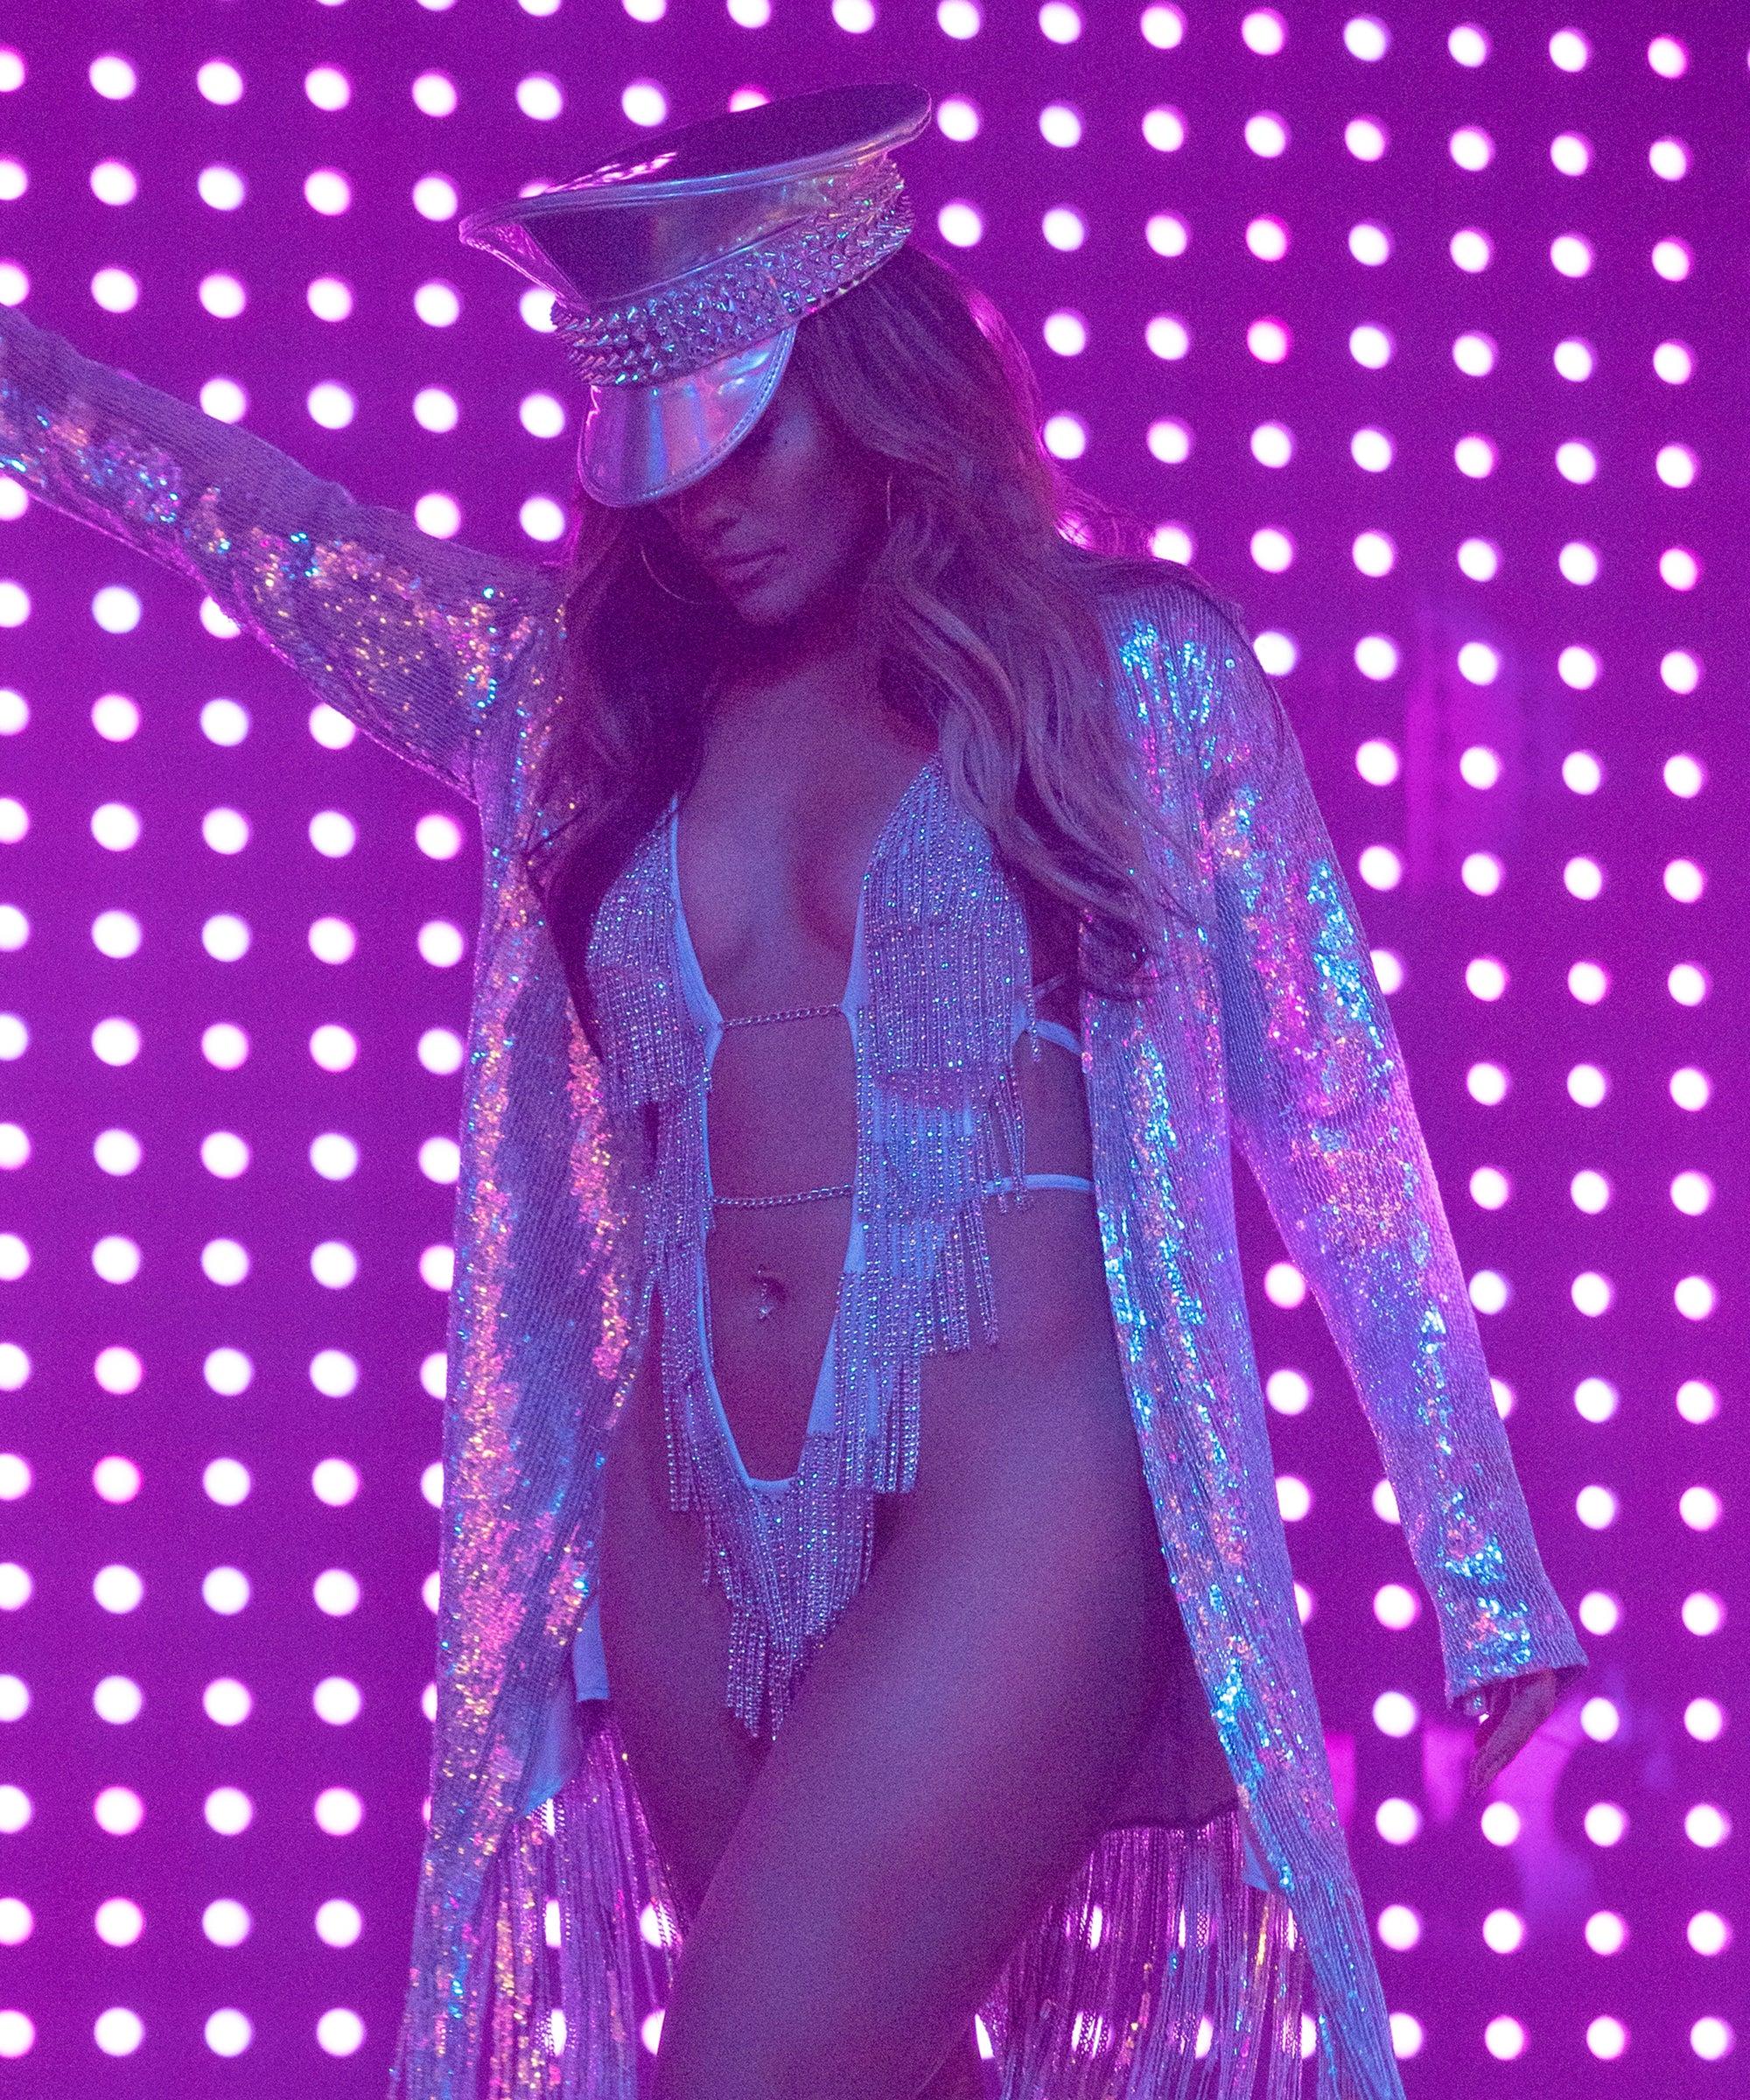 Give Jennifer Lopez An Oscar For Hustlers, You Cowards!